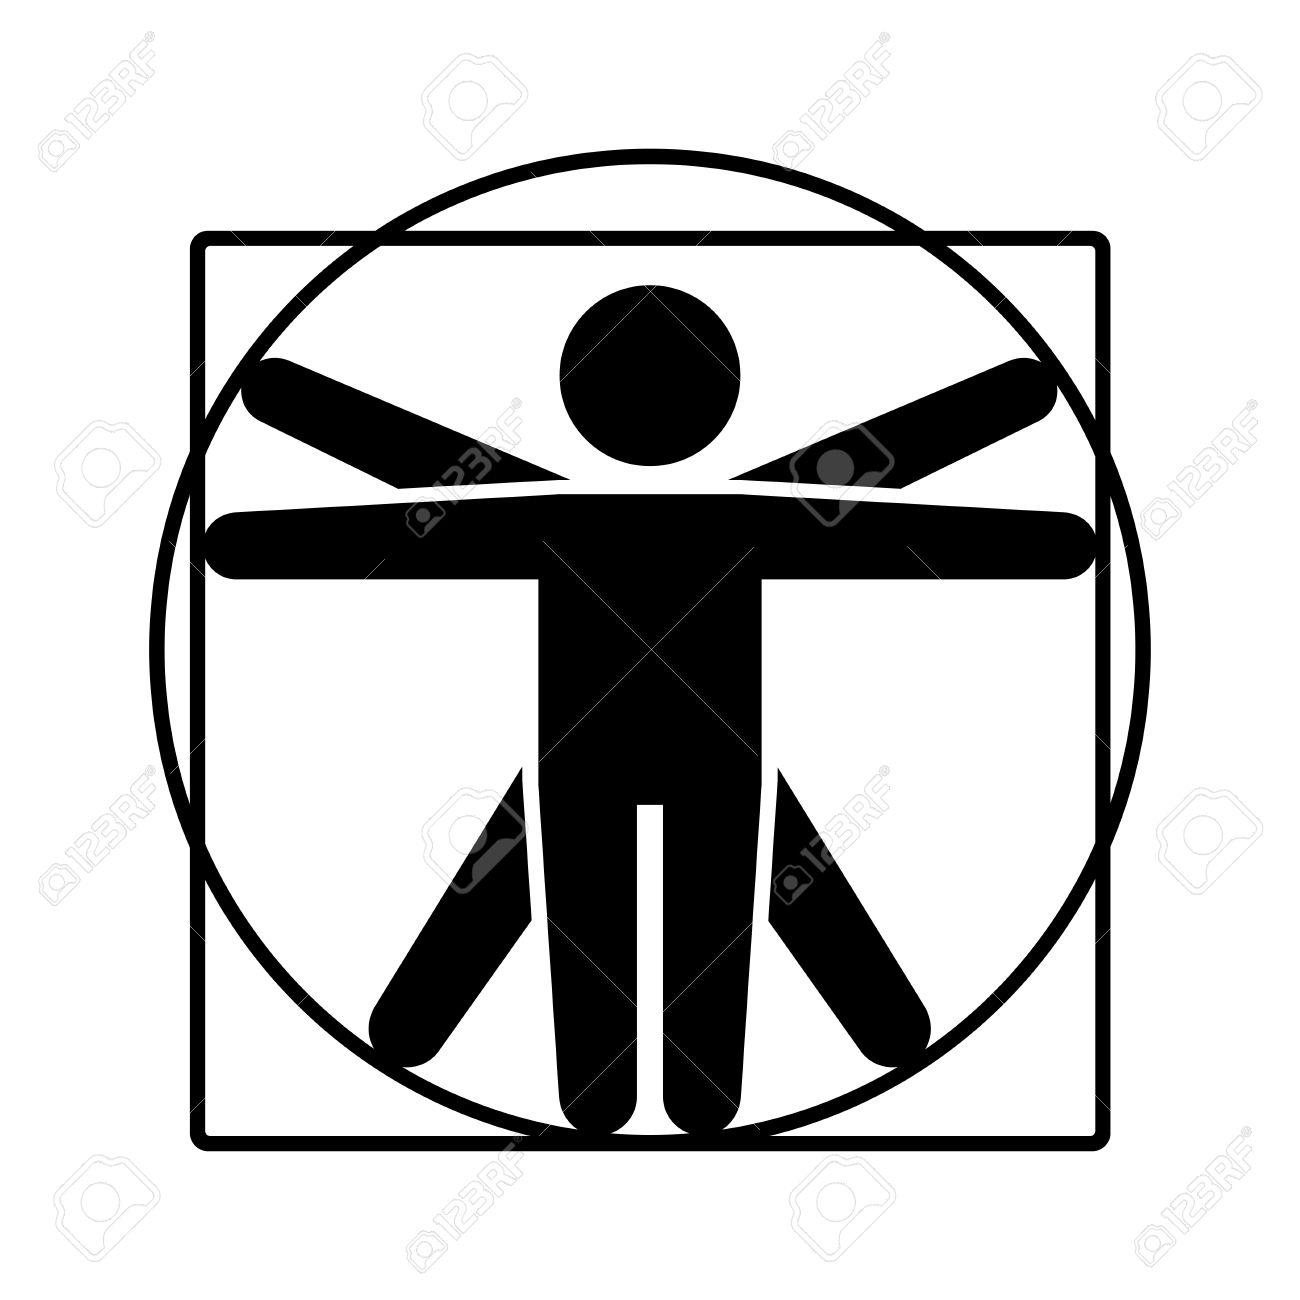 leonardo da vinci vitruvian man sign logo stick style icon rh 123rf com vitruvian man vector file vitruvian man vector free